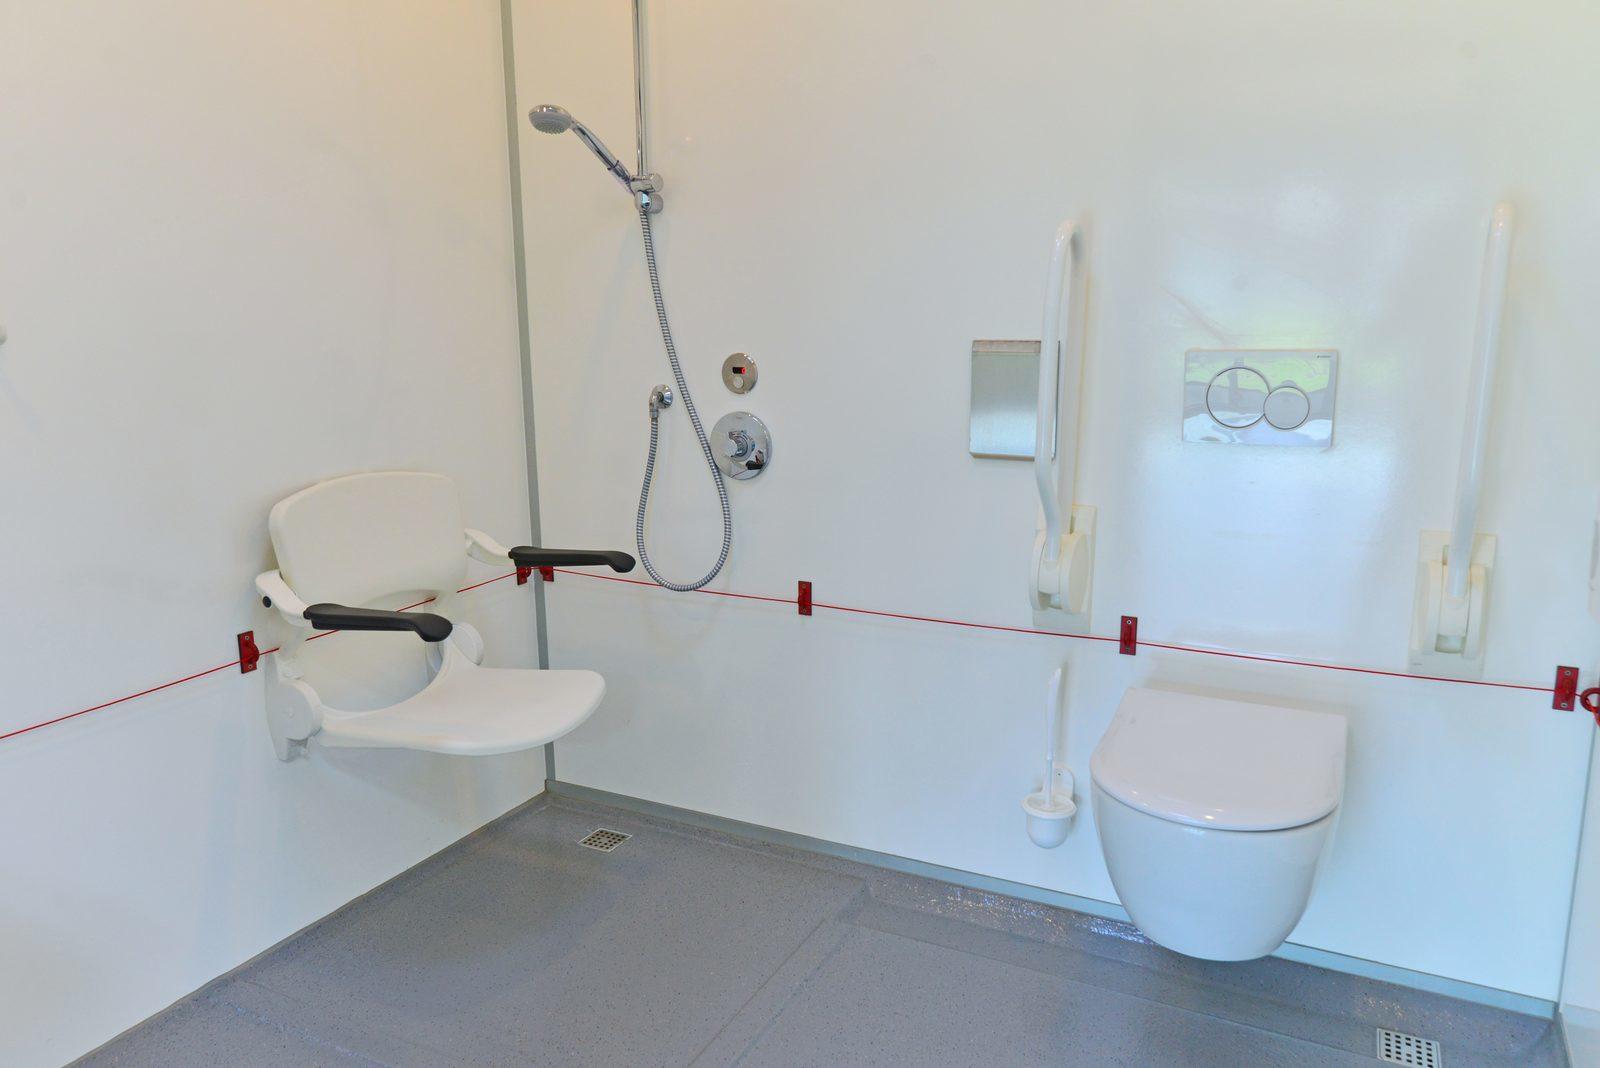 Invalidetoilet